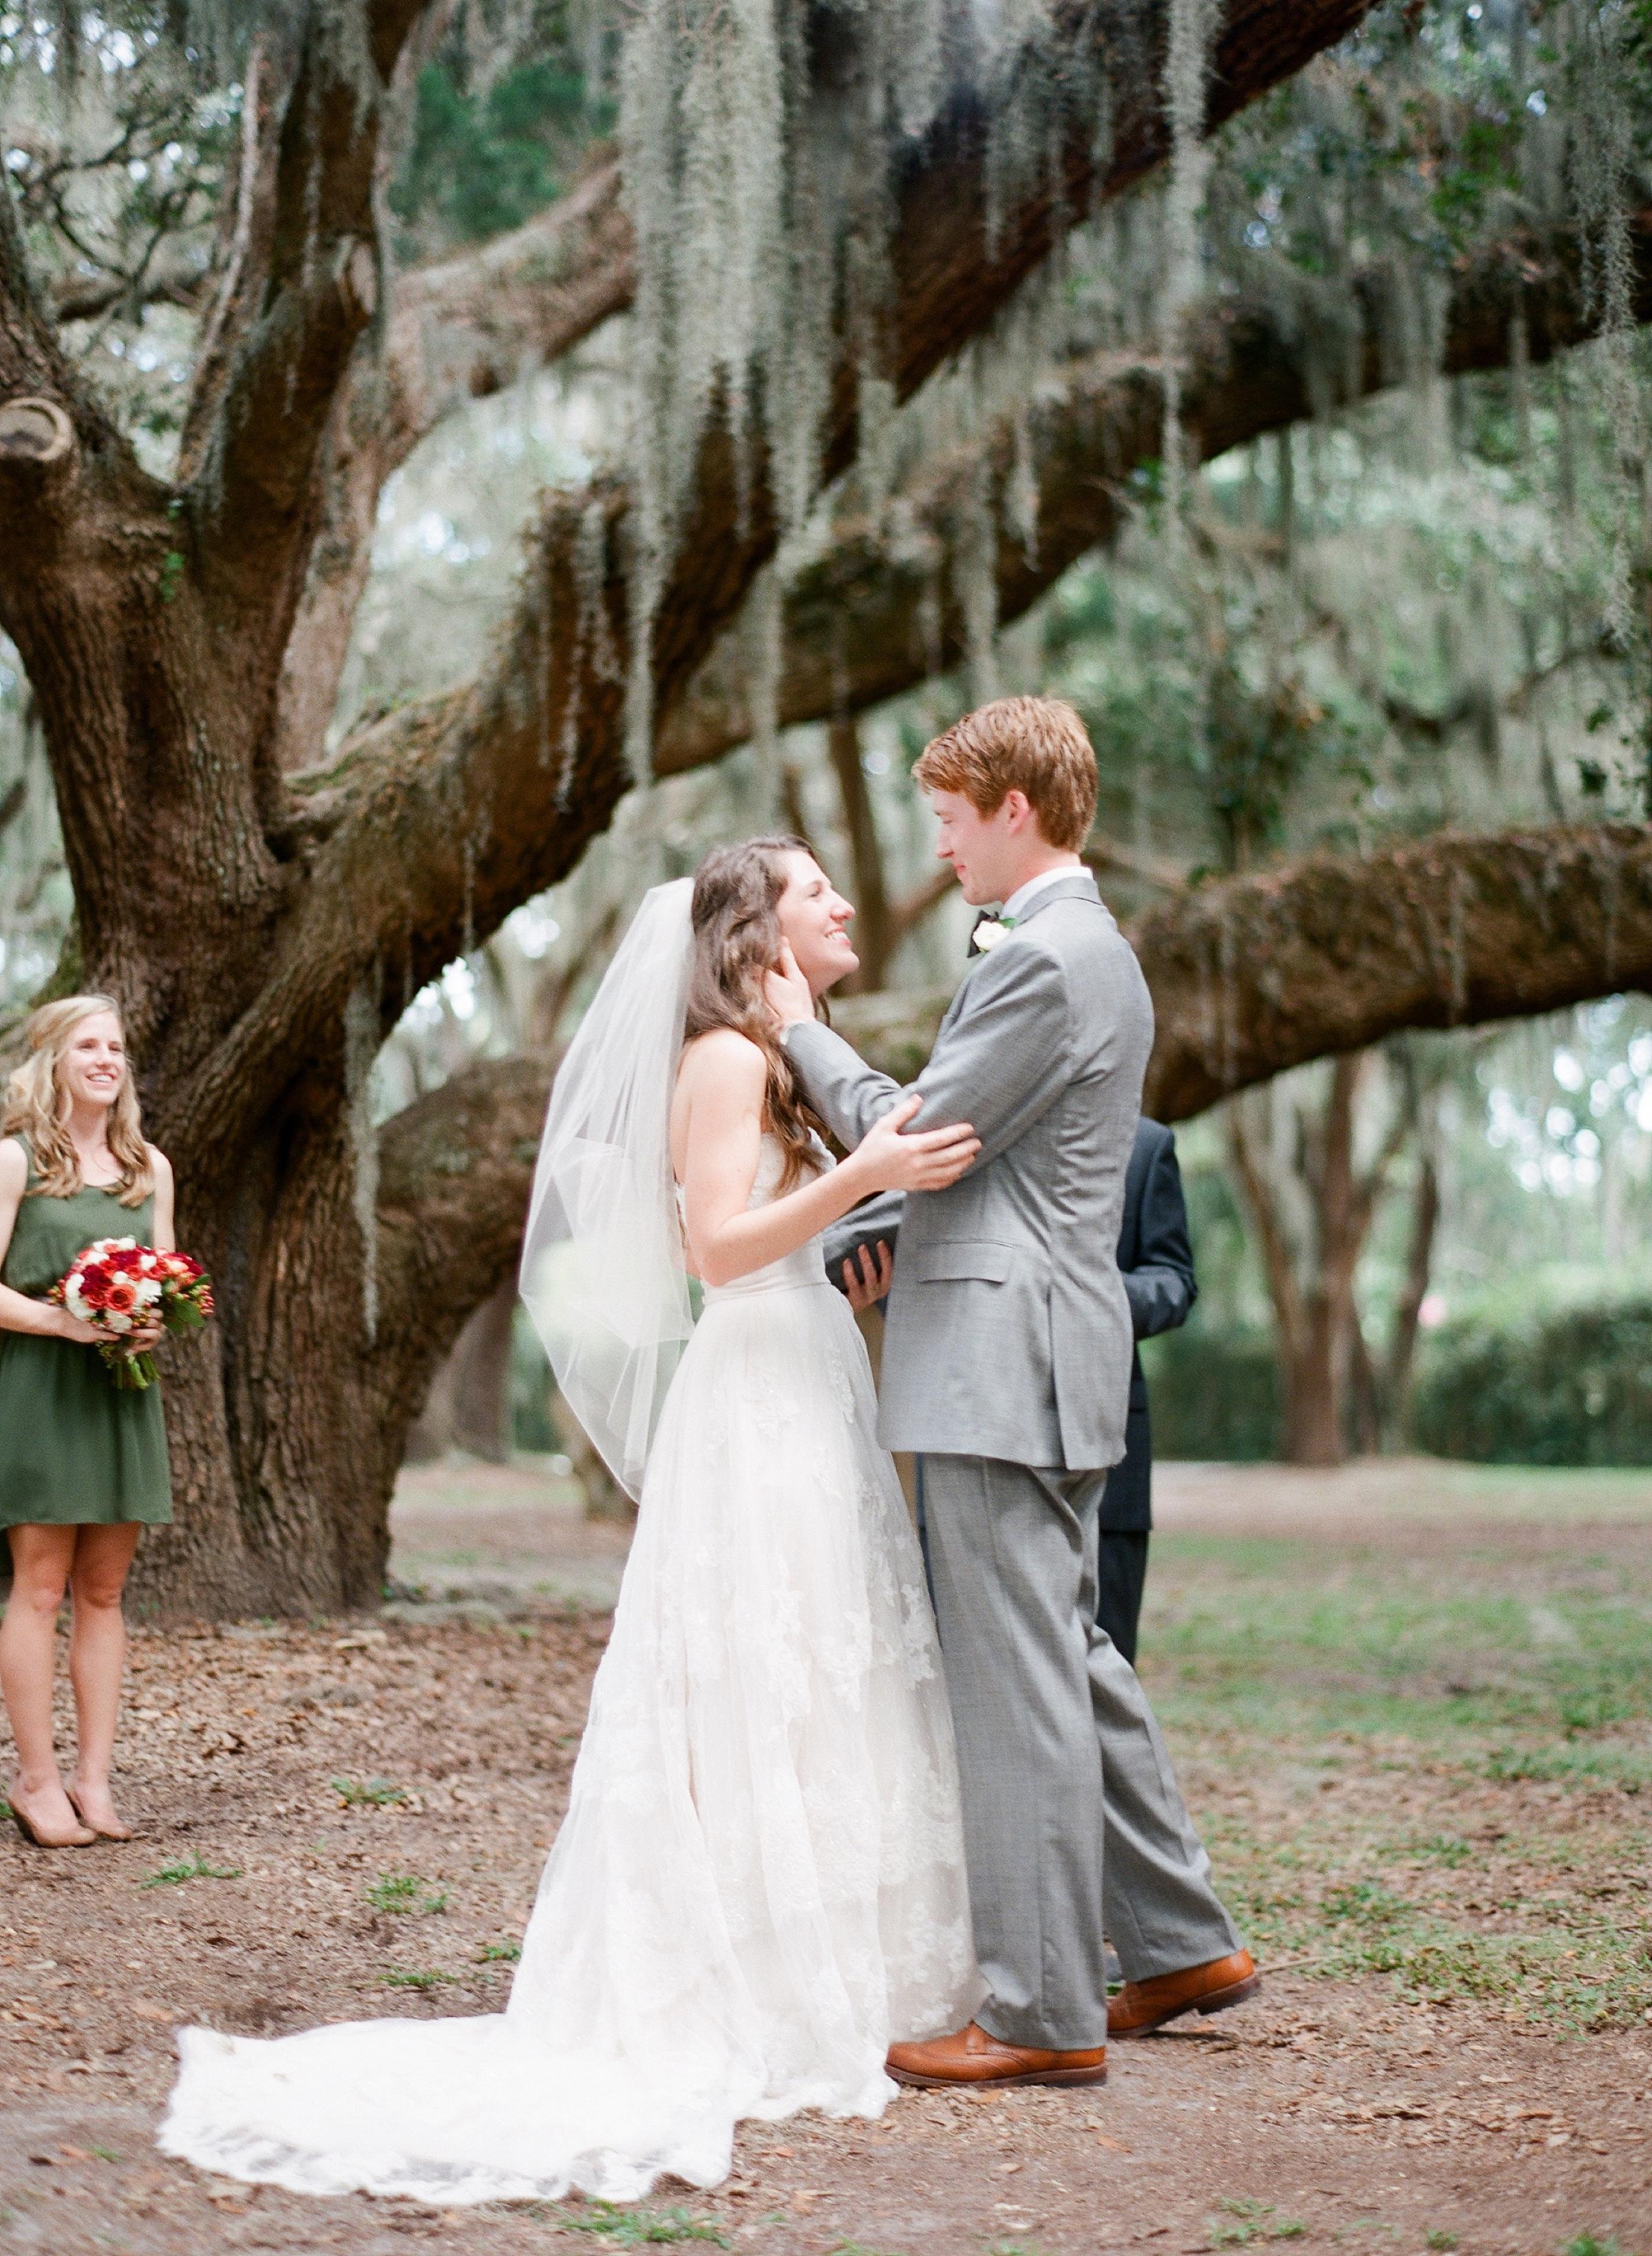 st_simons_island_wedding_photographer_shannon_griffin_0021.jpg